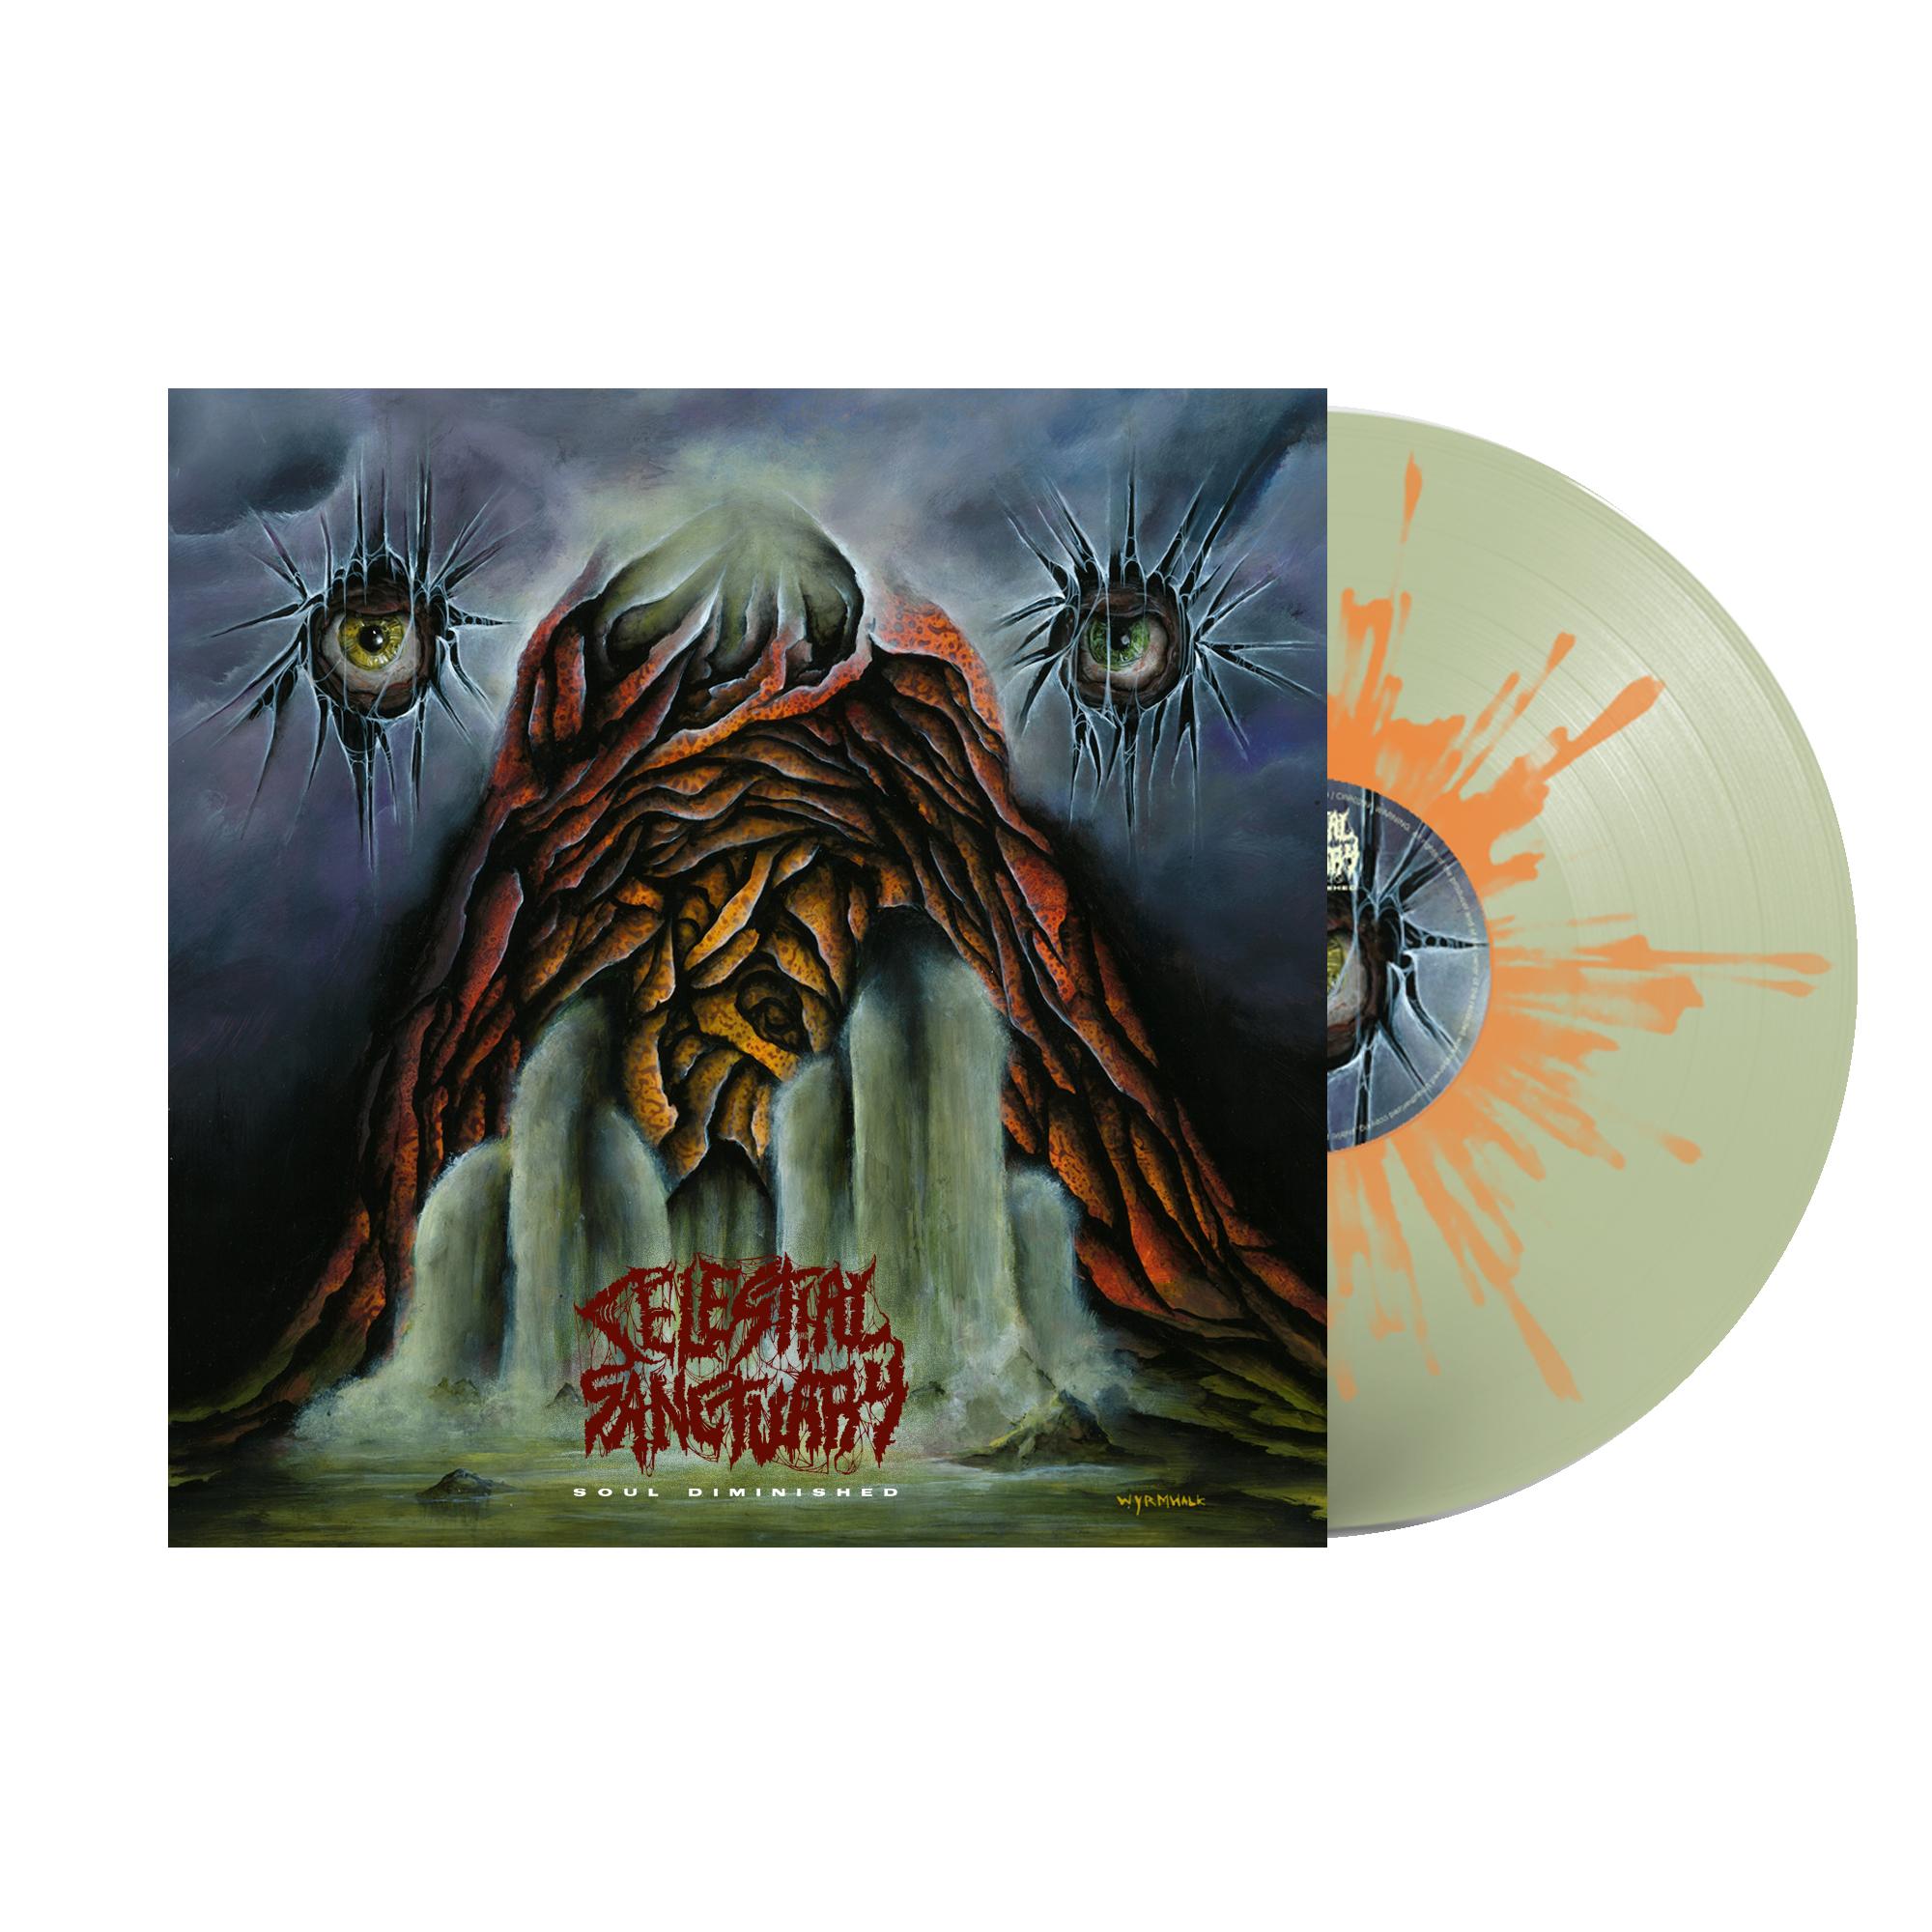 Celestial Sanctuary - Soul Diminished PREORDER